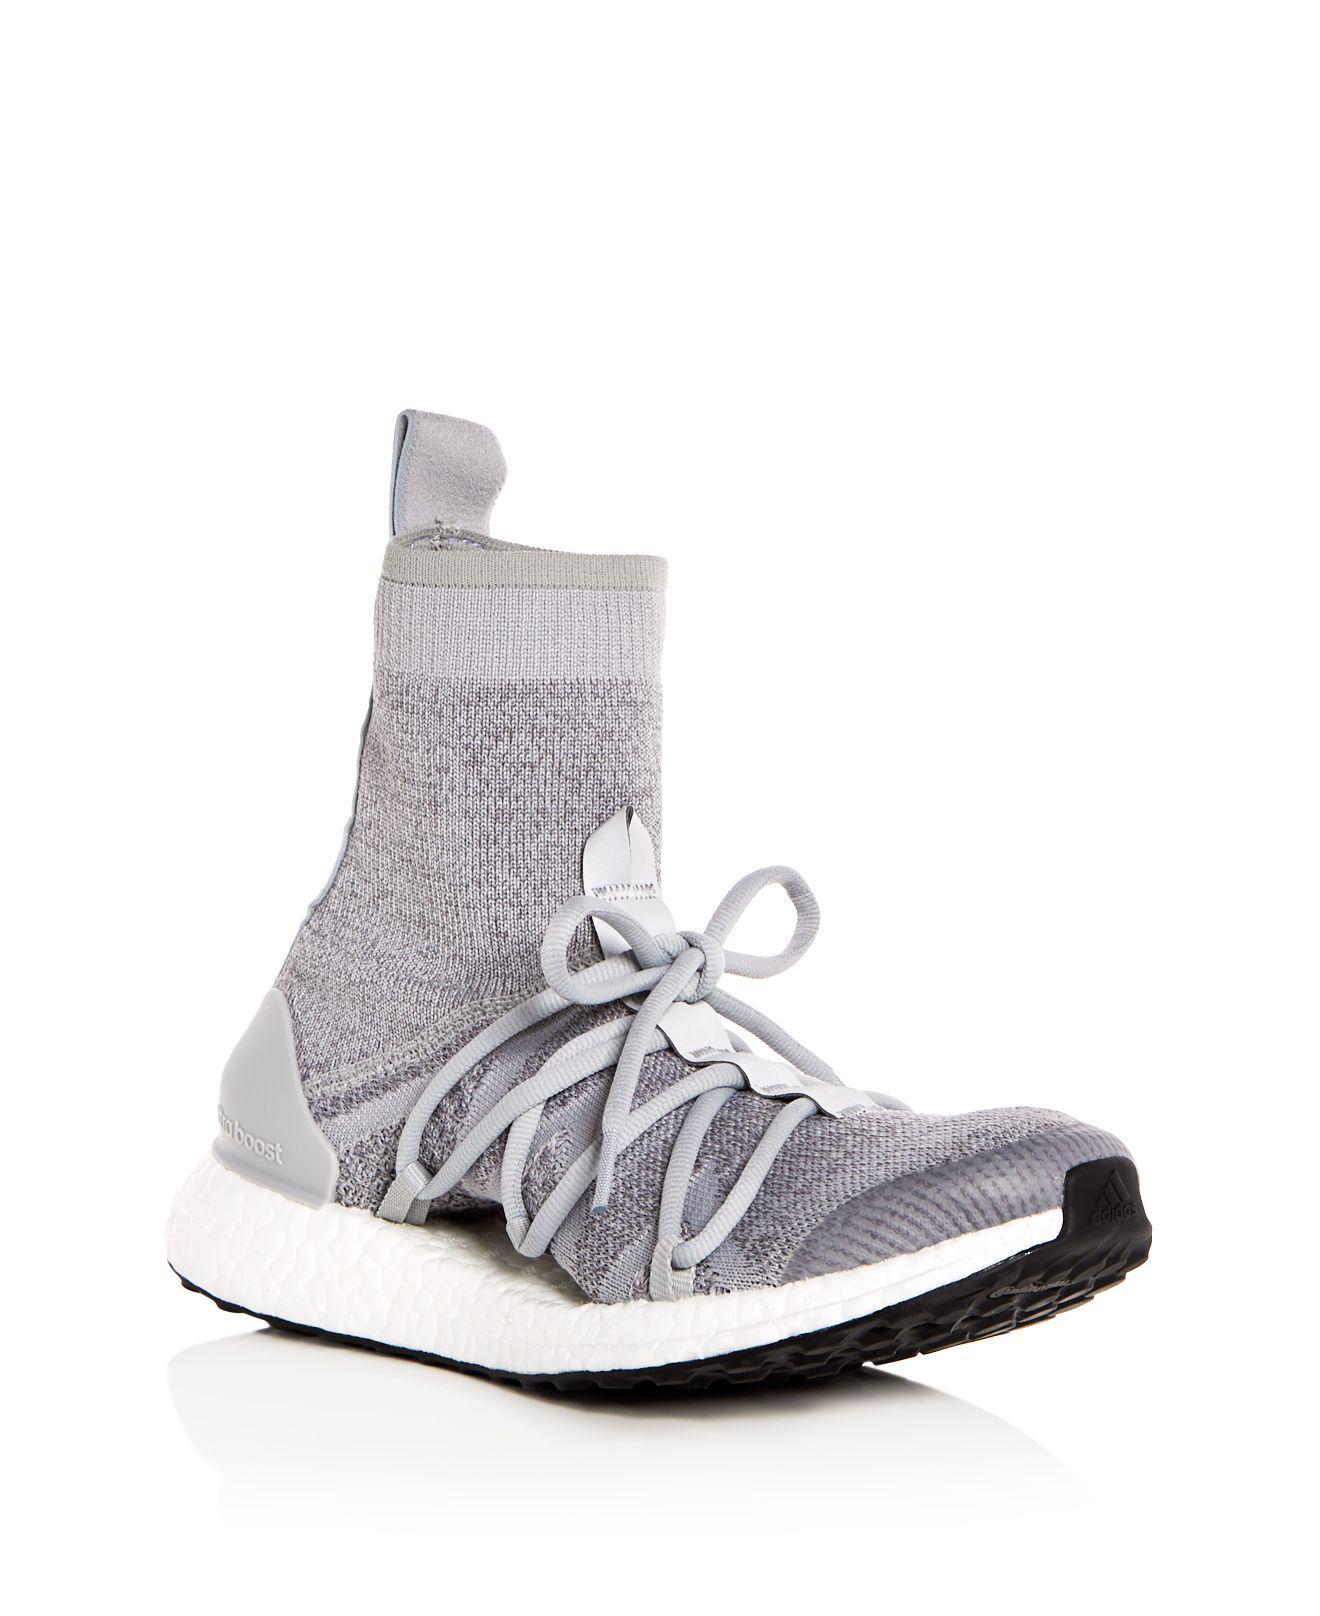 Ultra impulso x hightop sock scarpe adidas da stella mccartney